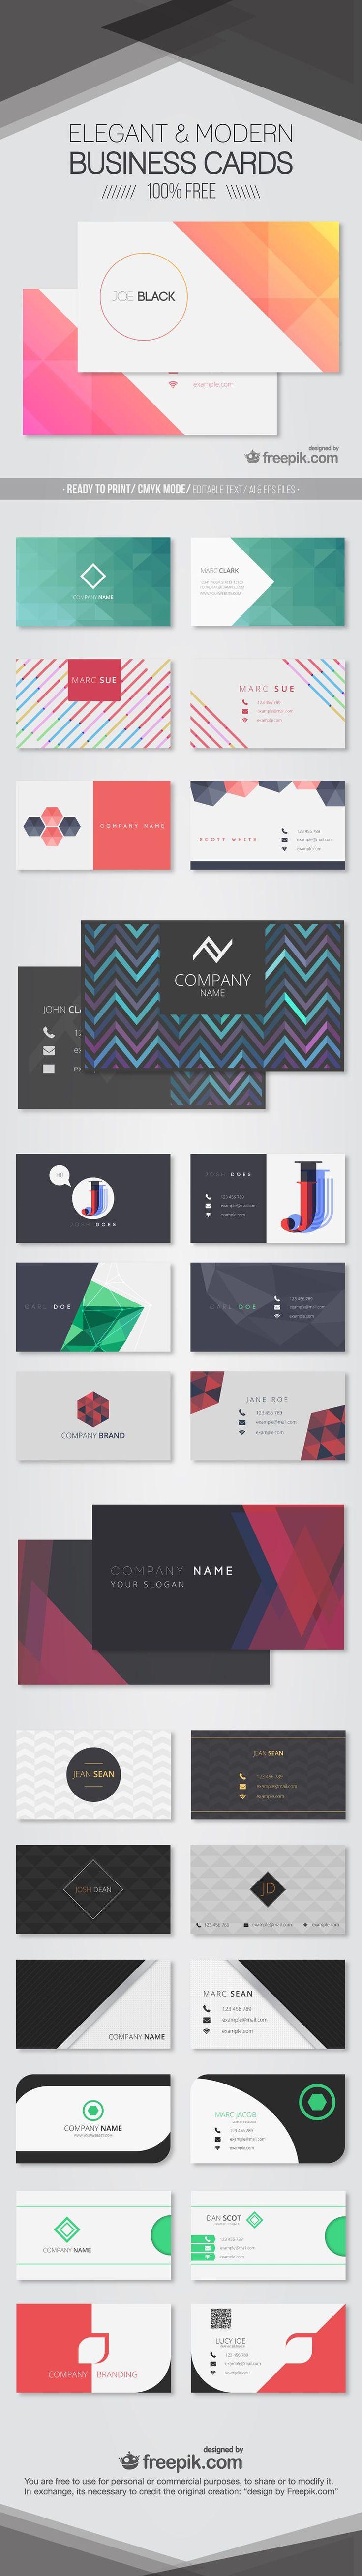 Elegant & Modern Business Card Template